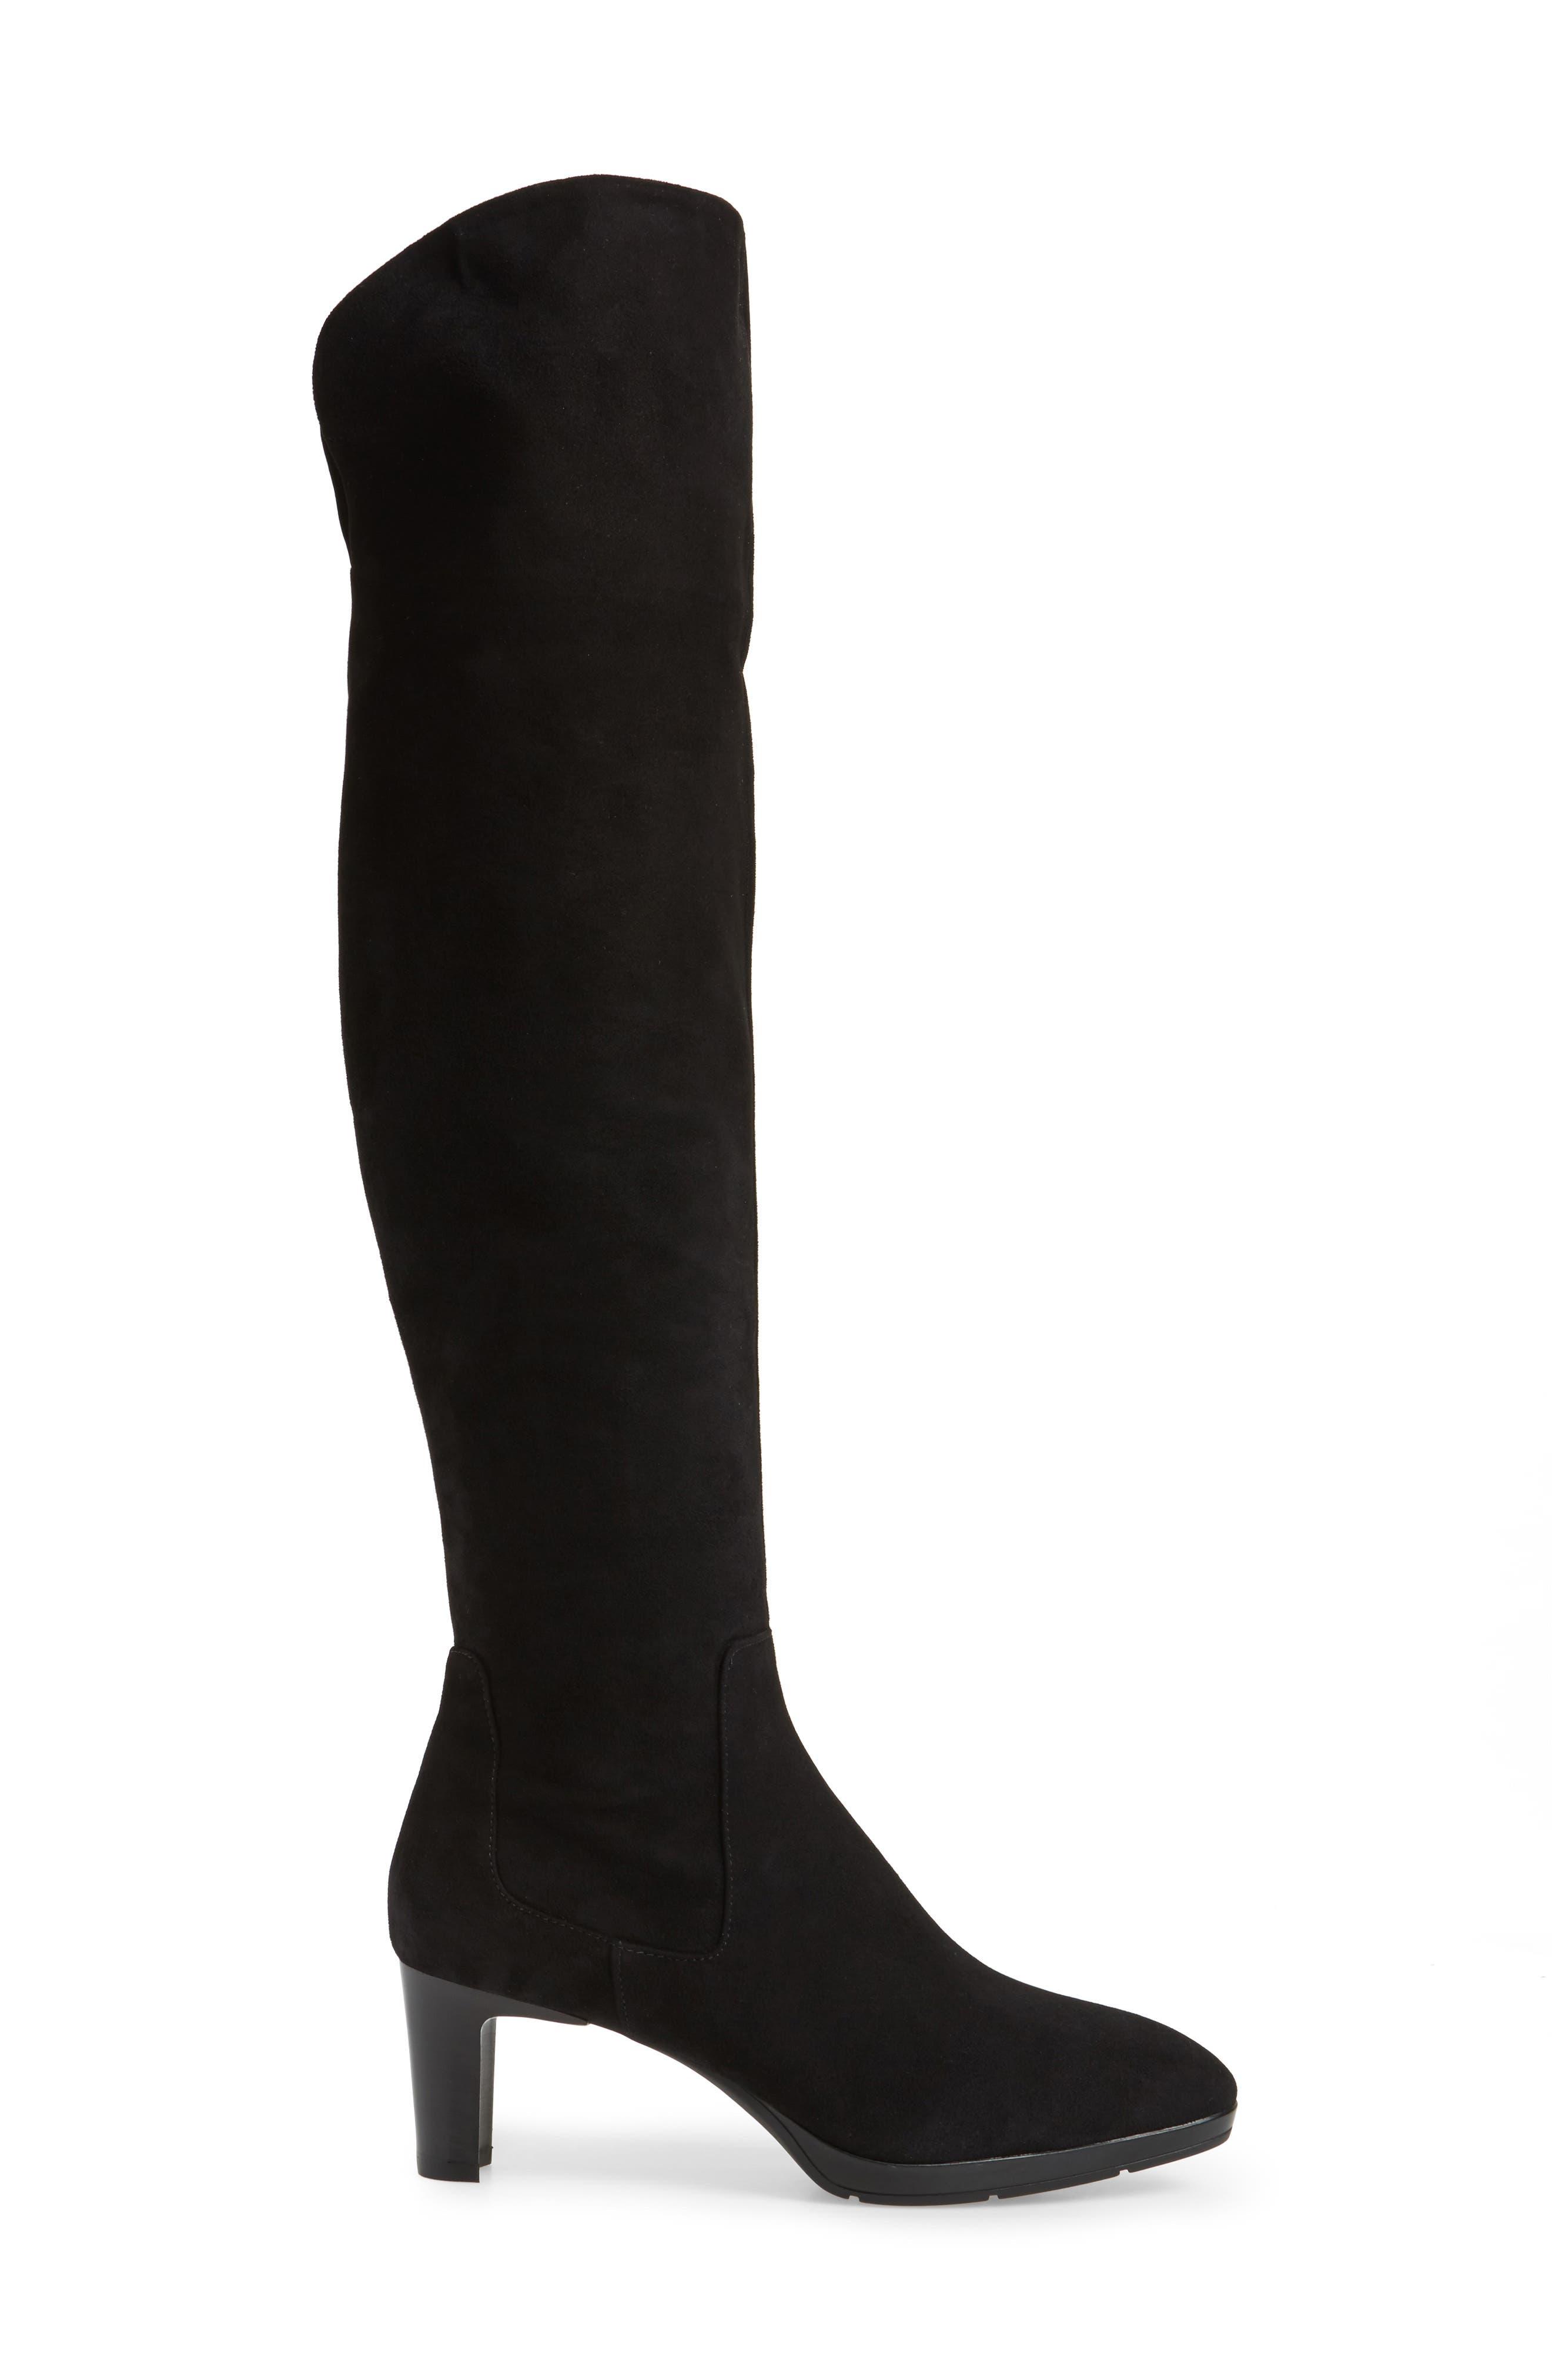 Alternate Image 3  - Aquatalia Danika Weatherproof Over-the-Knee Boot (Women)